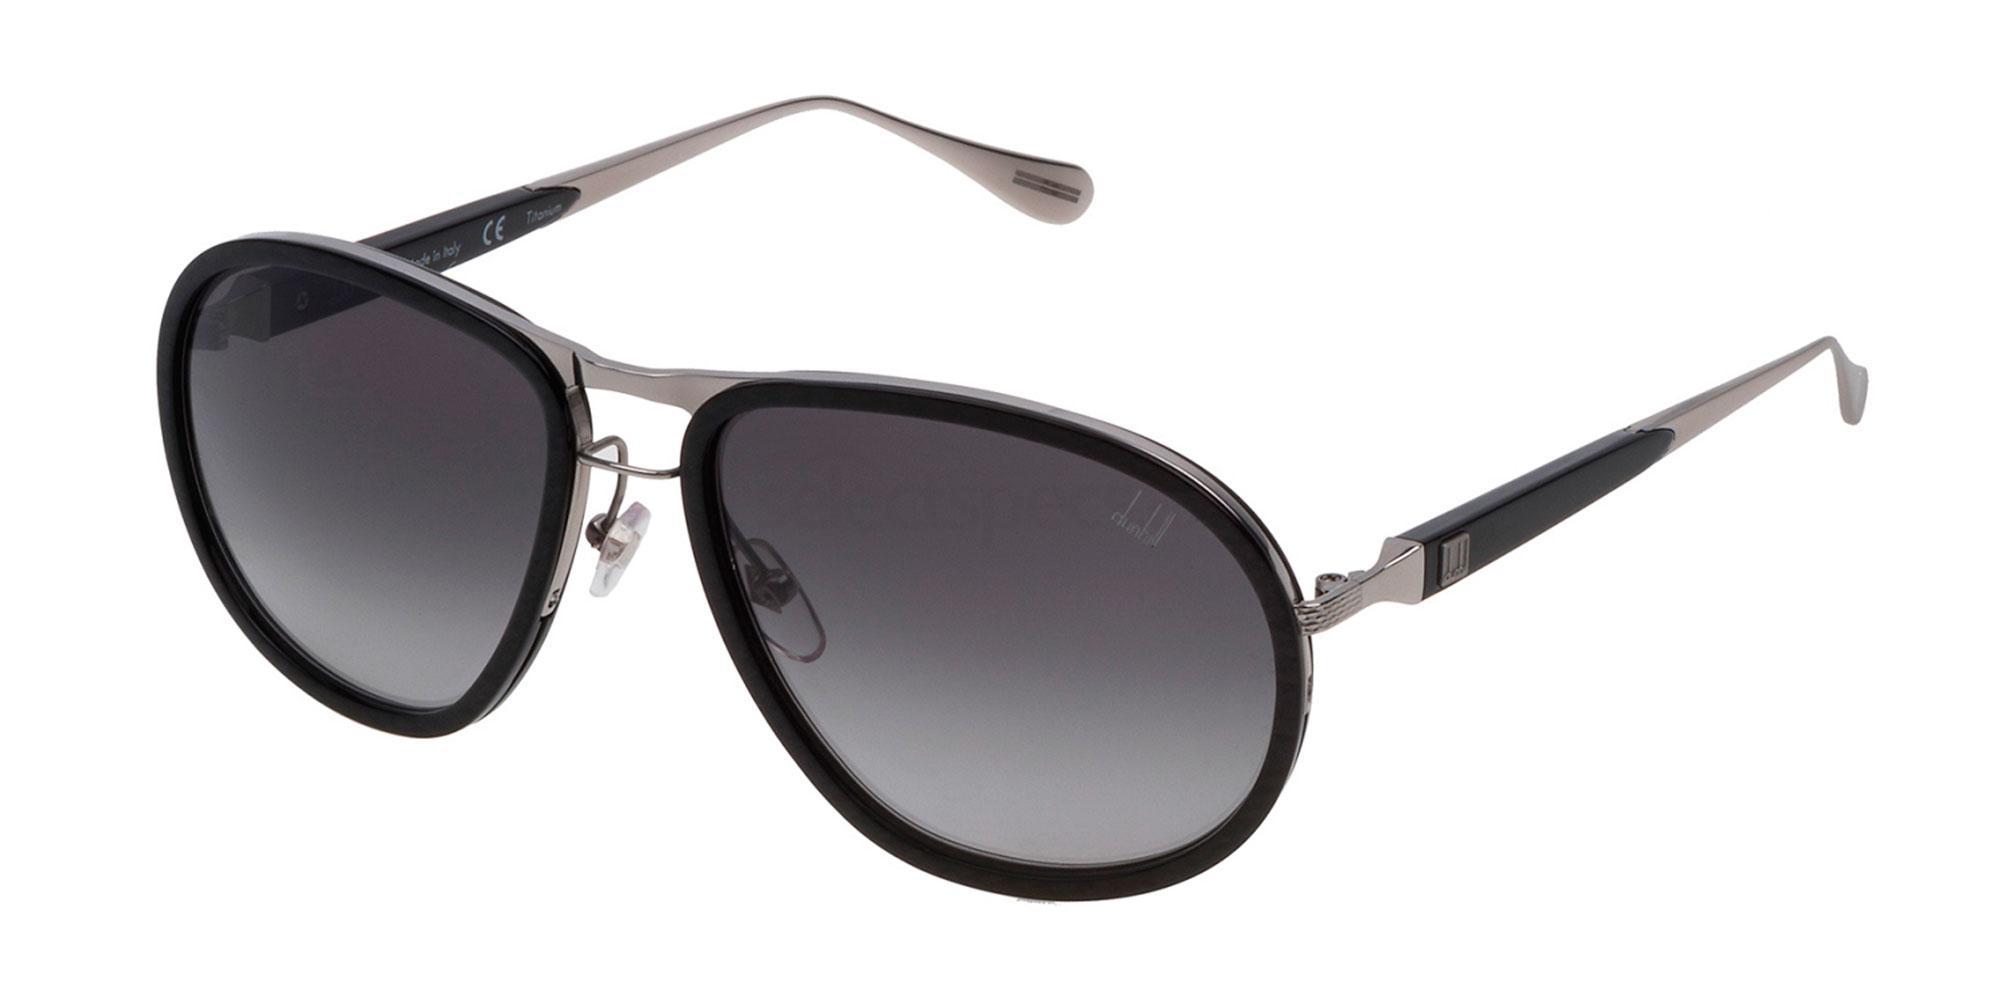 02AN SDH096M Sunglasses, Dunhill London